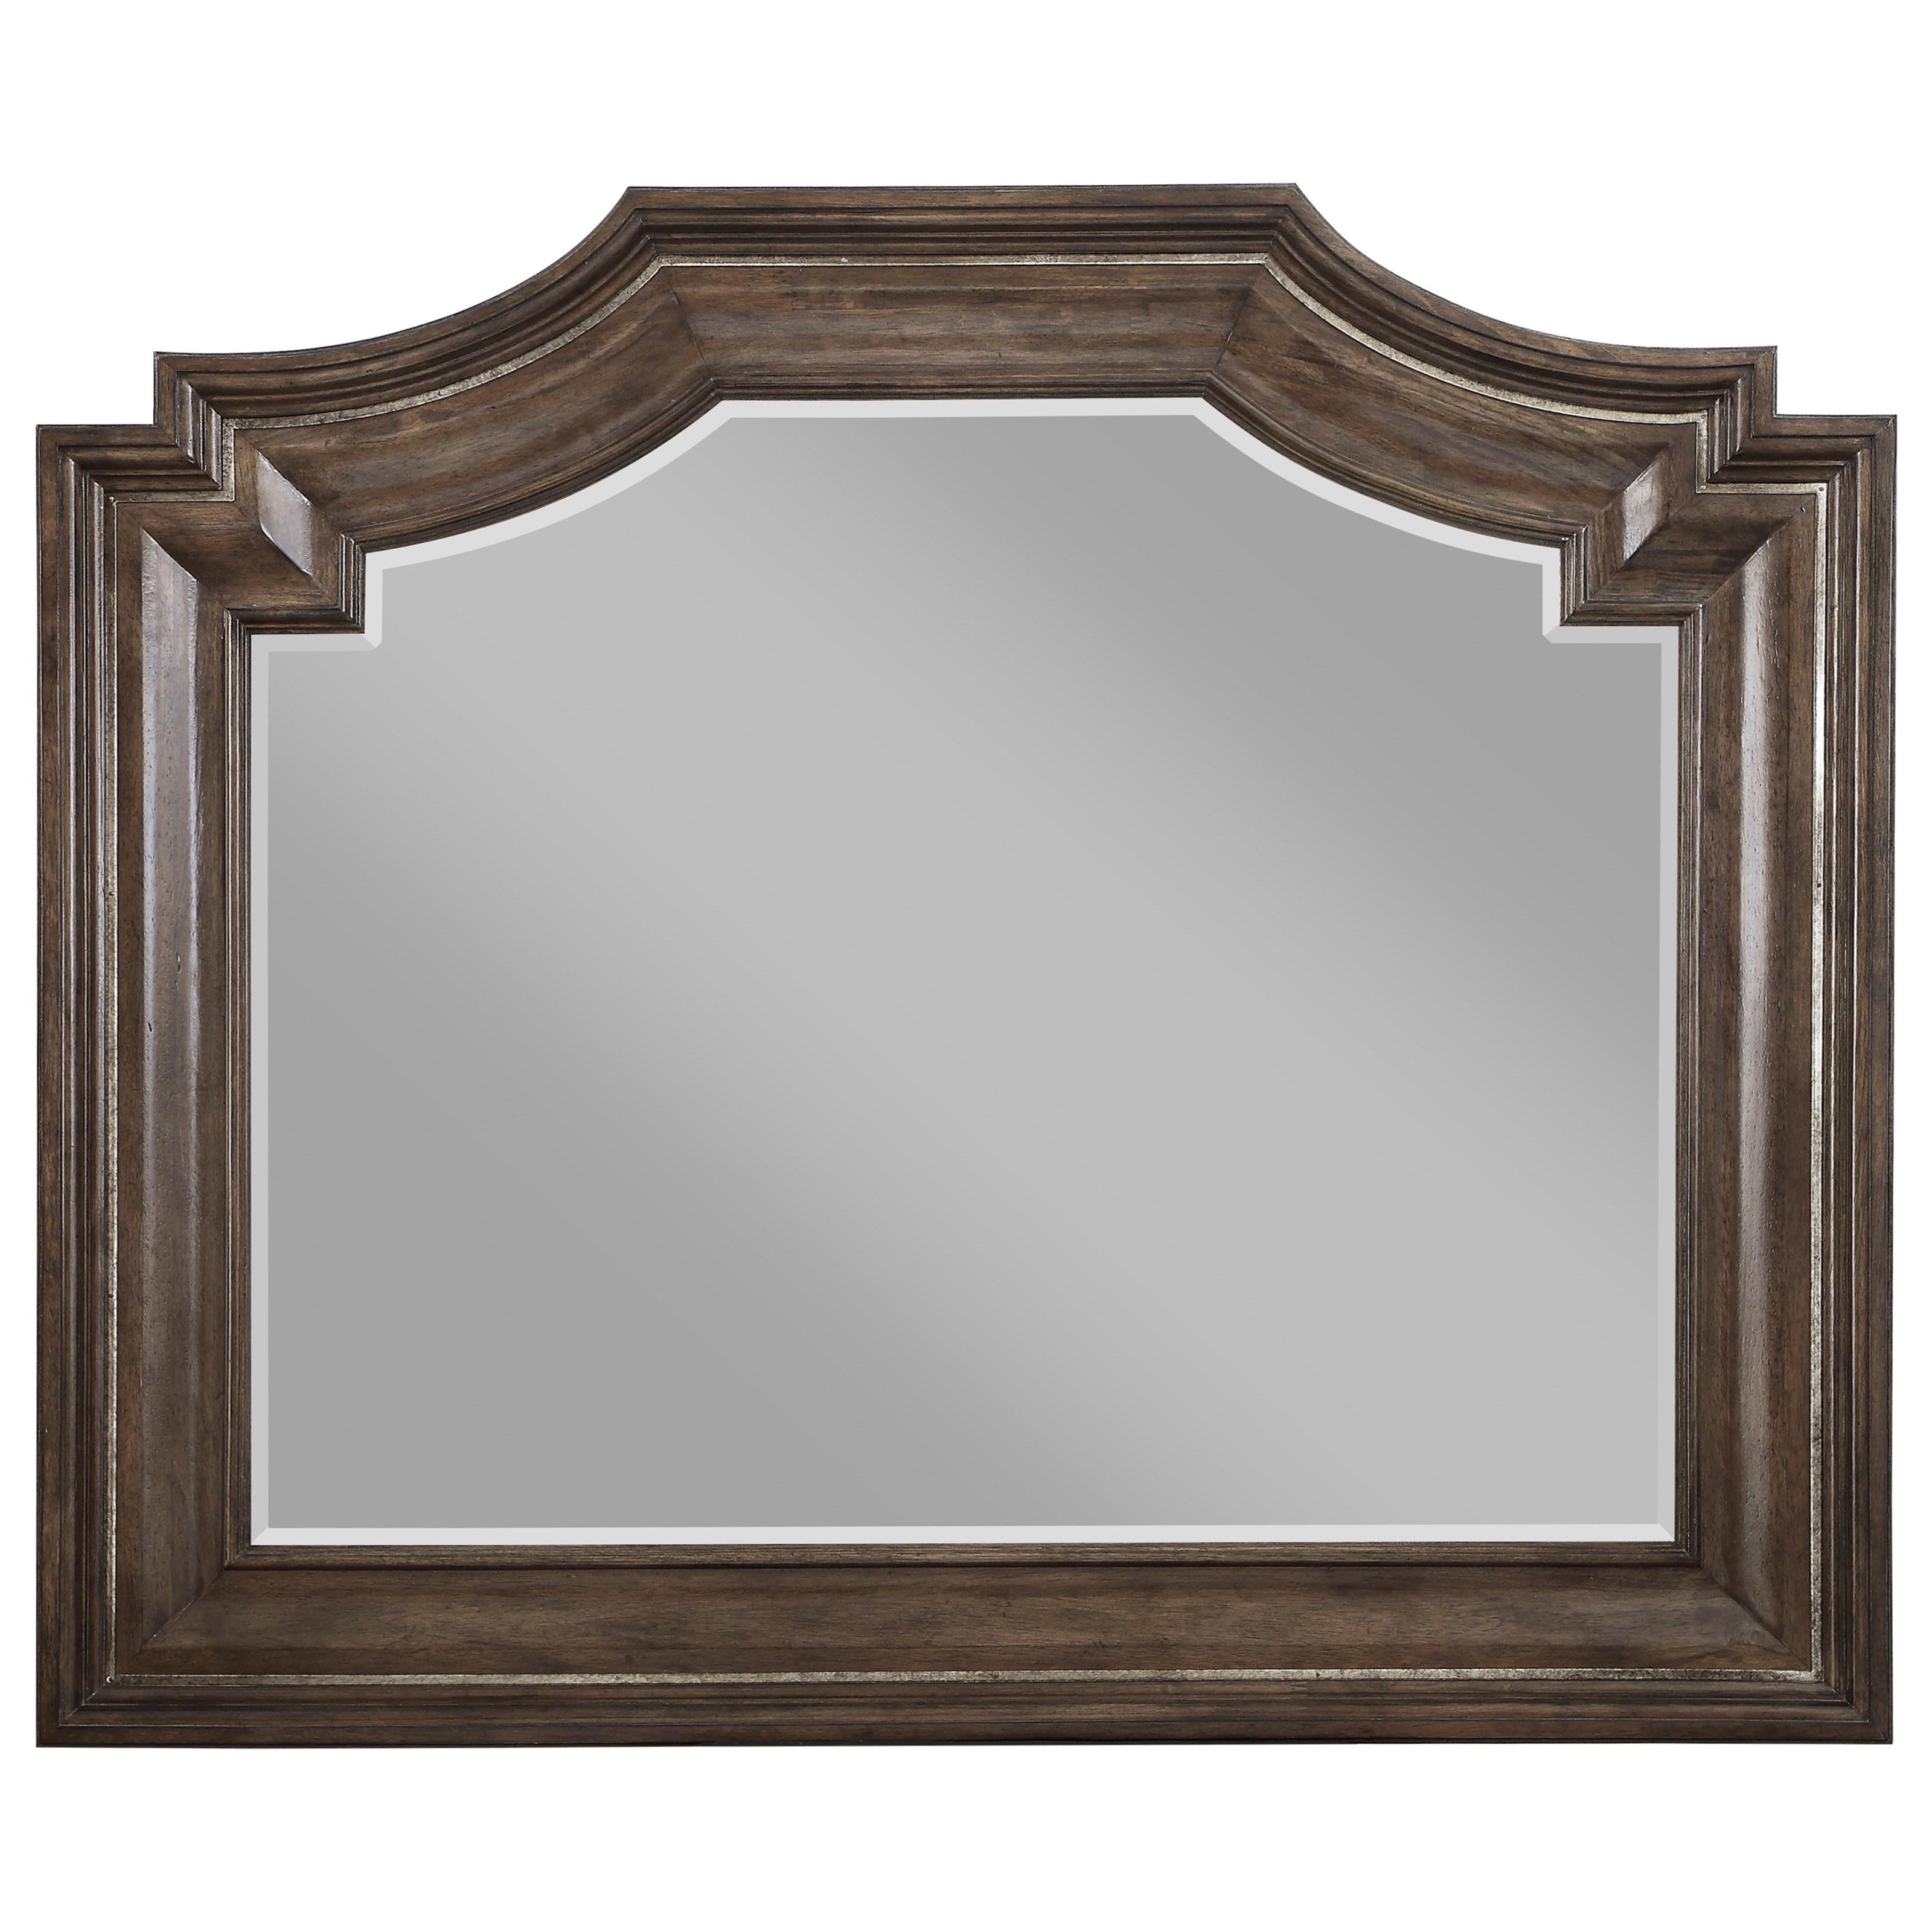 Landmark Mirror by A.R.T. Furniture Inc at Michael Alan Furniture & Design